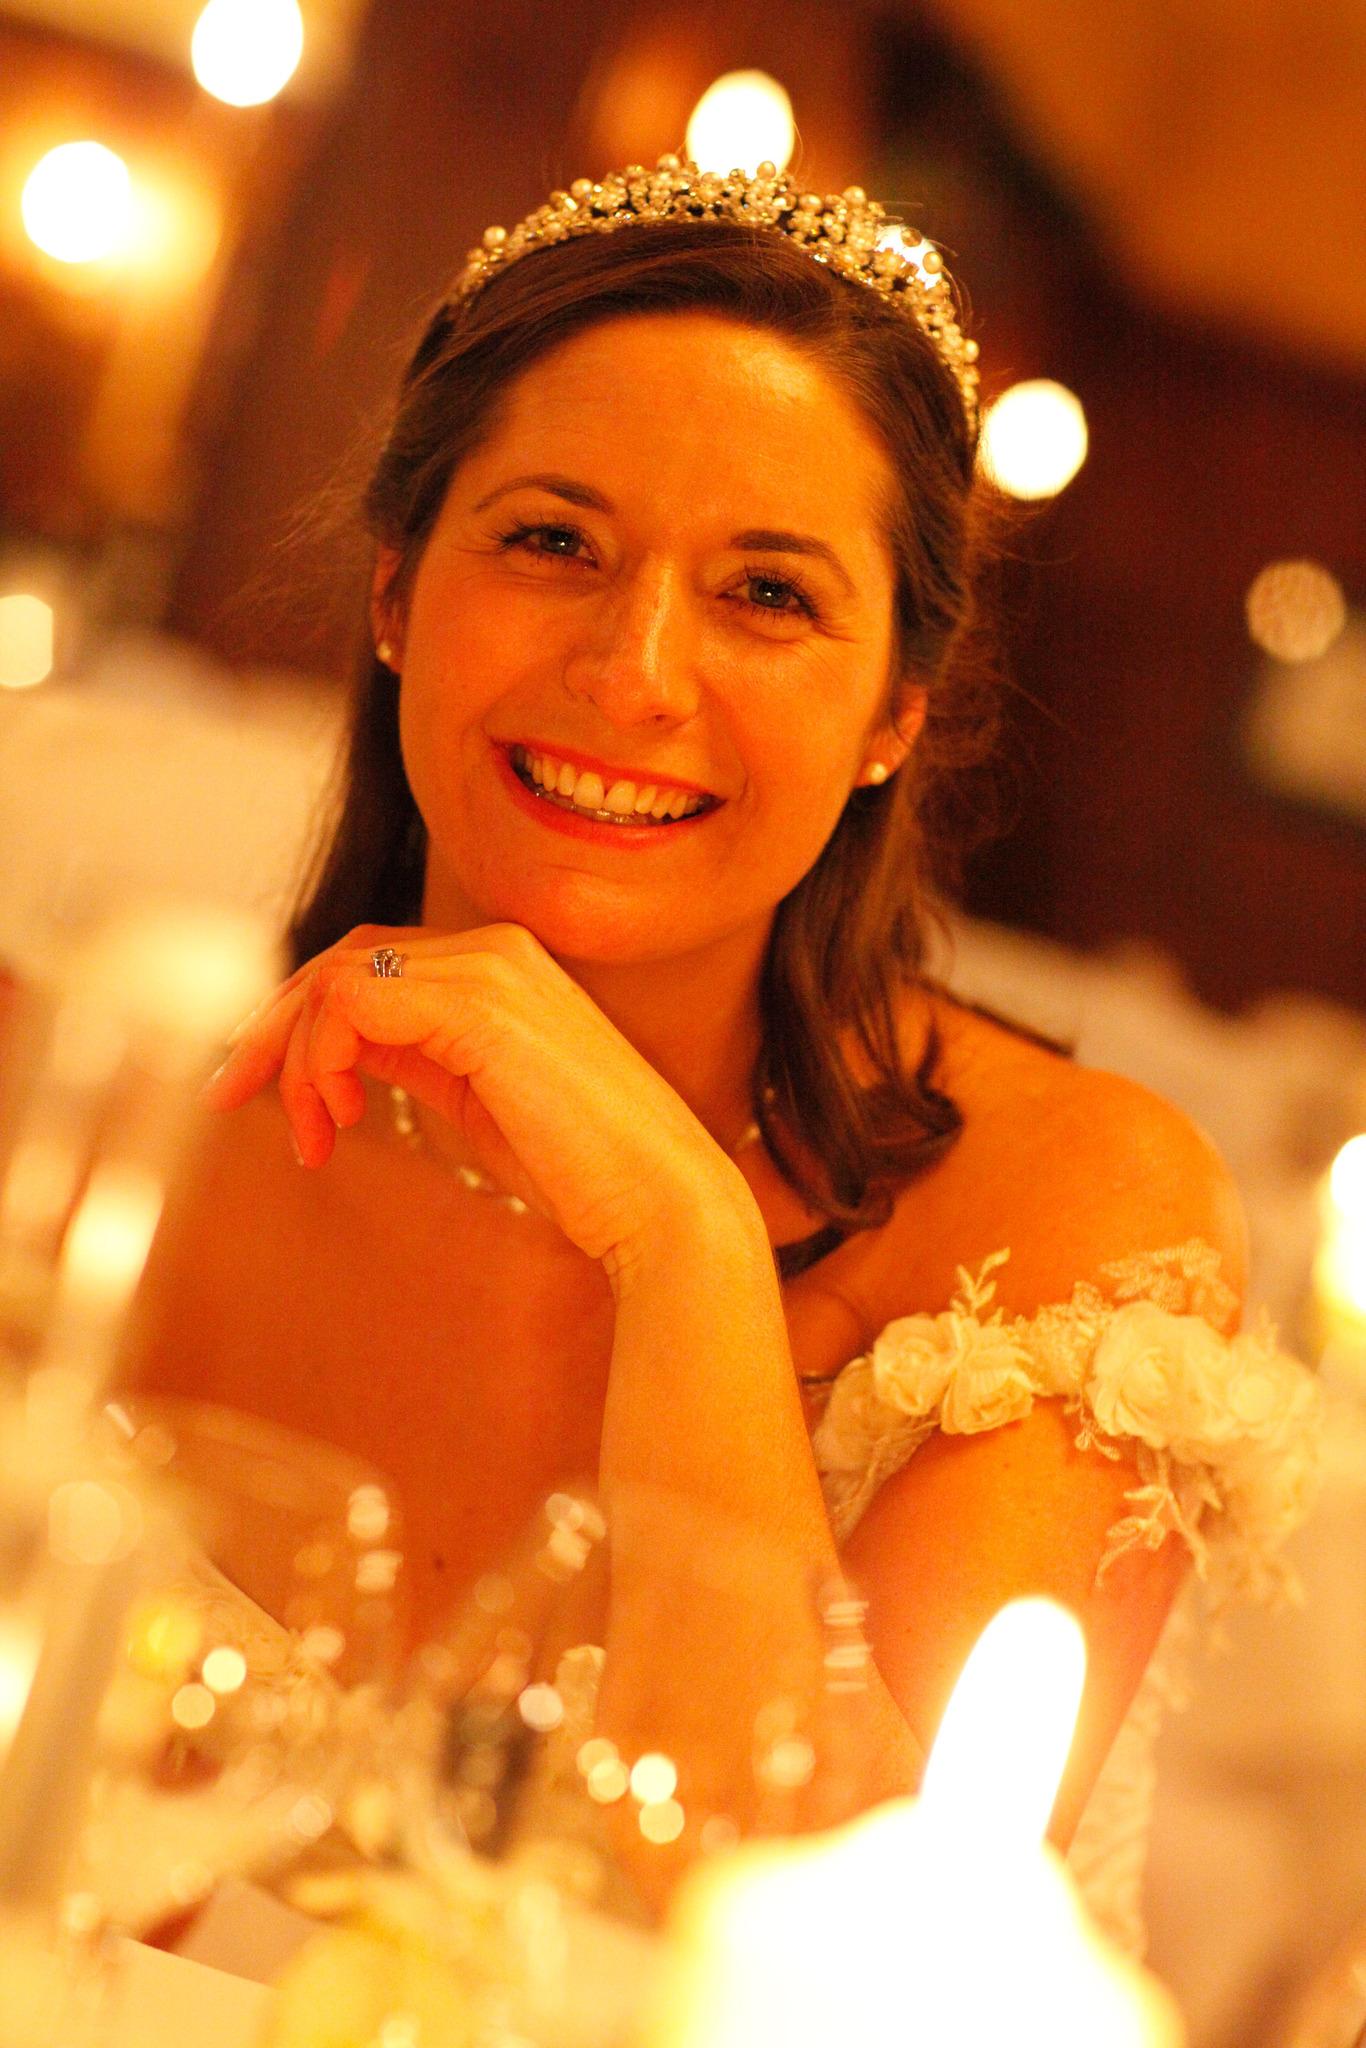 FBW_Winter_Weddings_026.jpg